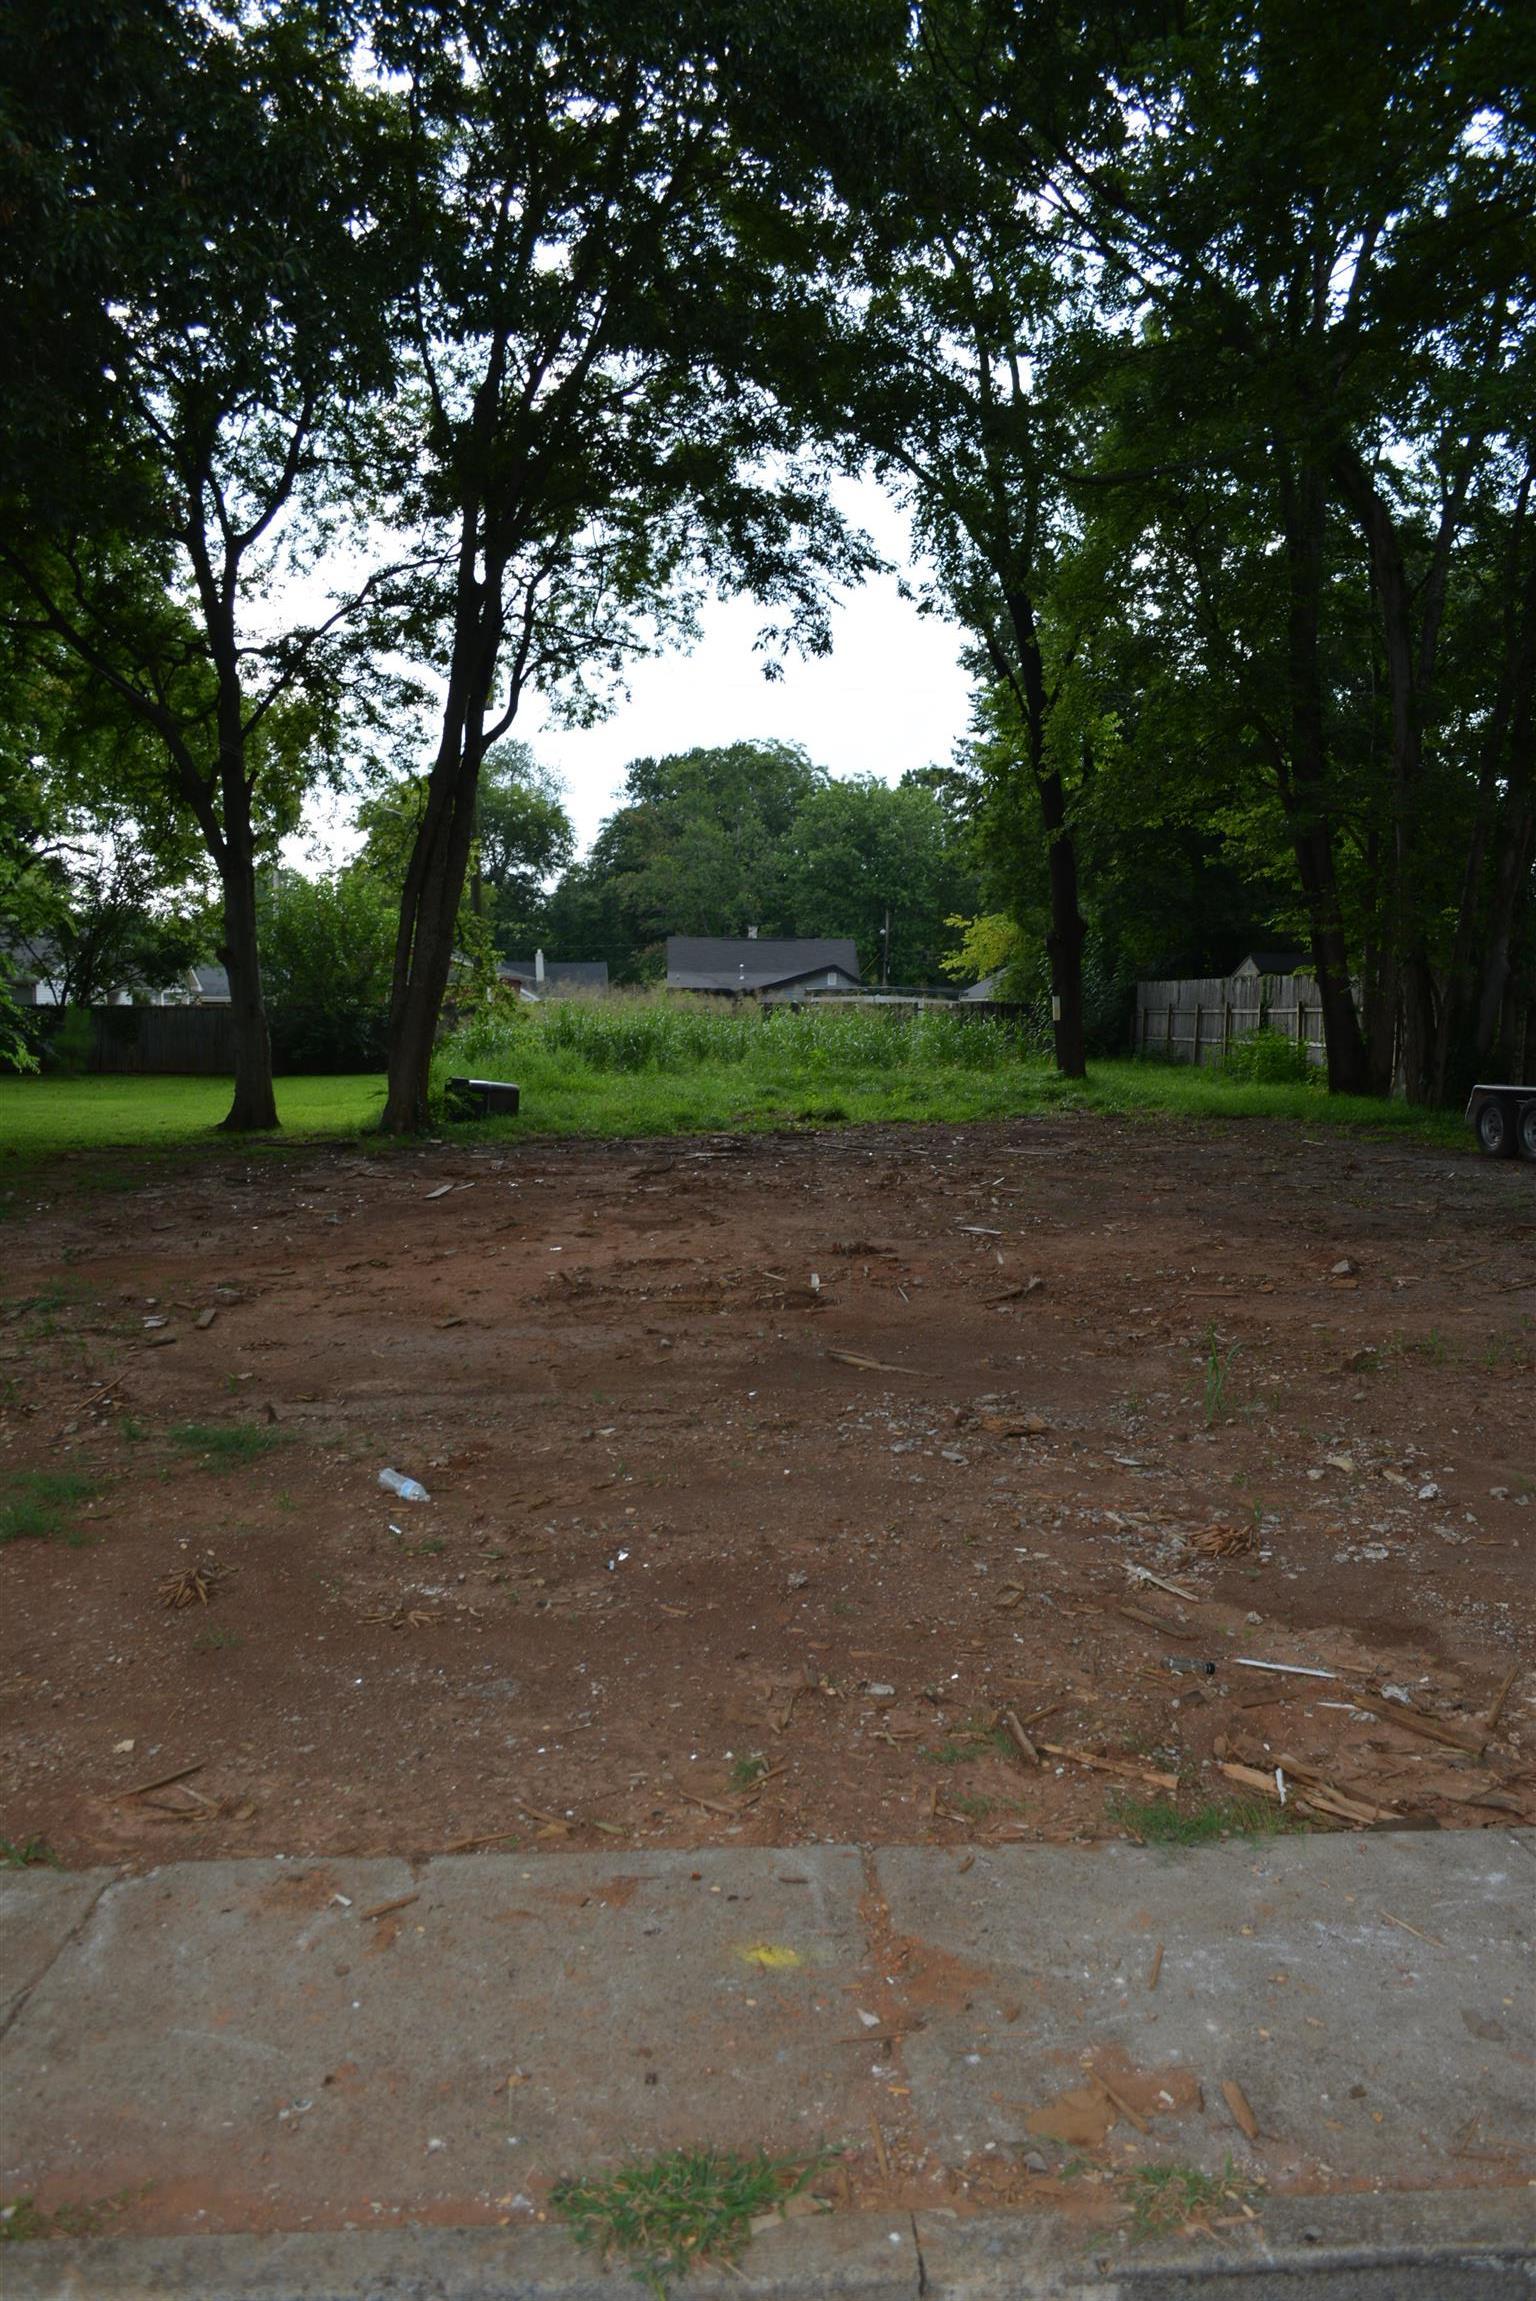 218 Richardson Ave, Murfreesboro, TN 37130 - Murfreesboro, TN real estate listing